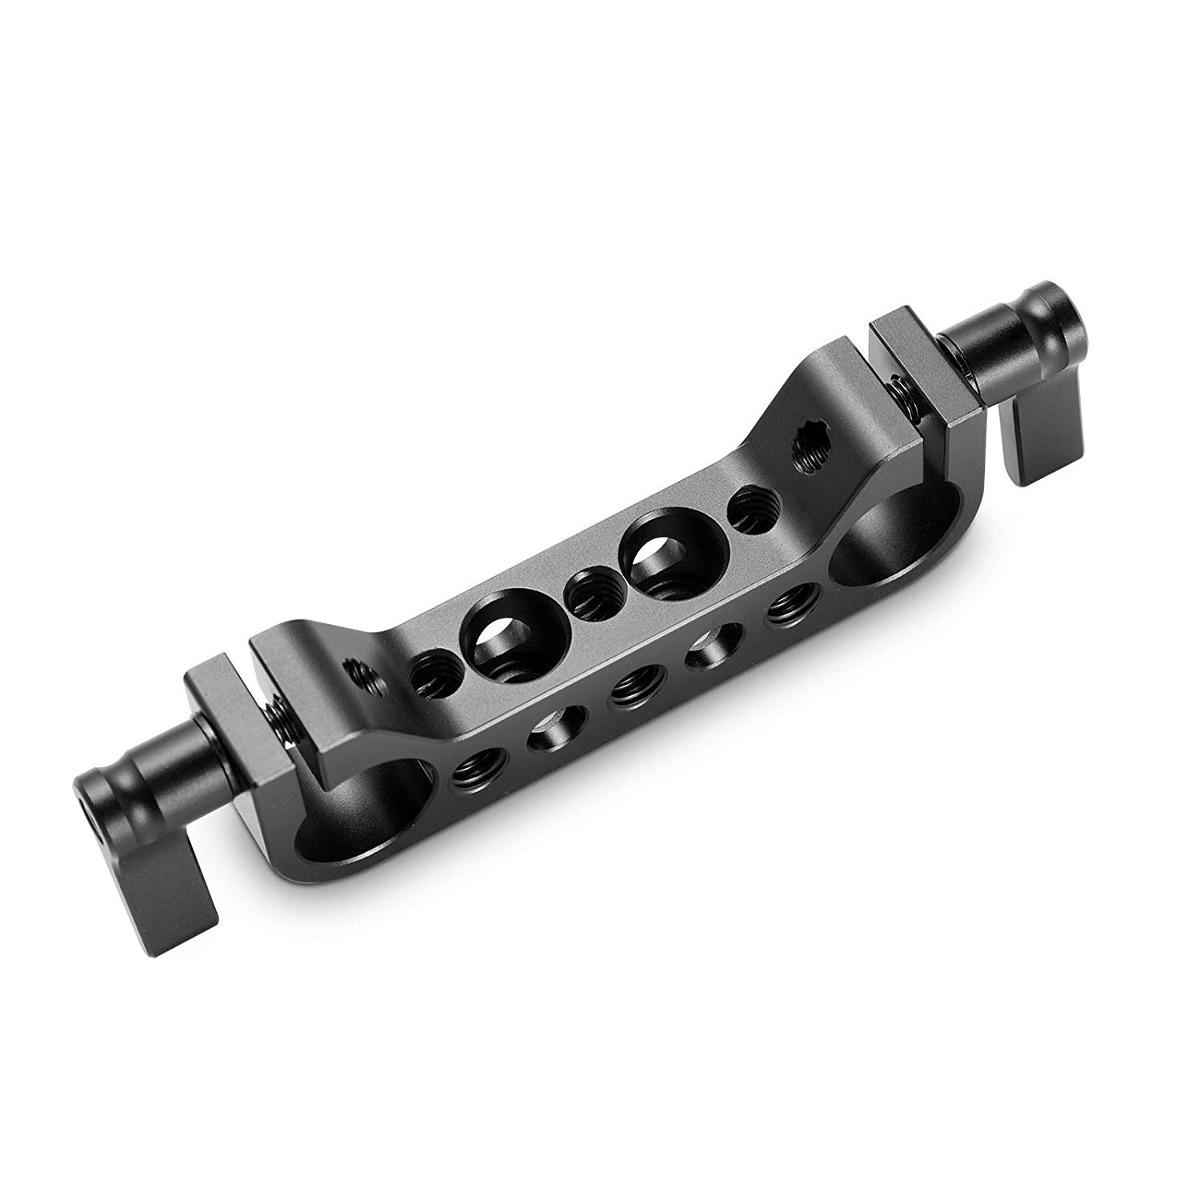 65018ec22 Smallrig Fresca Queso Railblock 15mm Soporte Universal Para ...